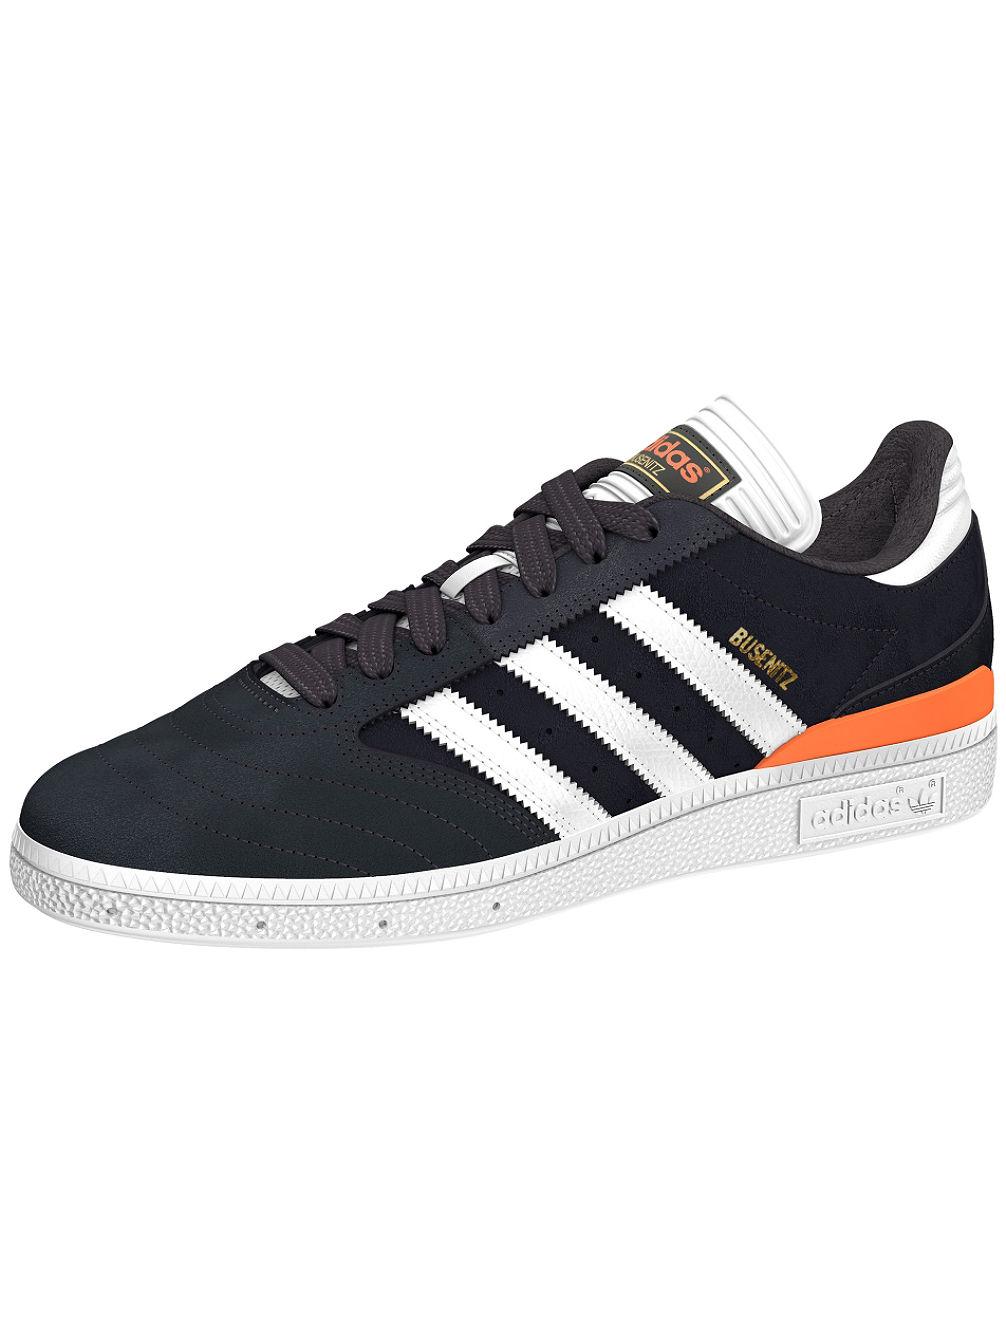 adidas-skateboarding-busenitz-skate-shoes